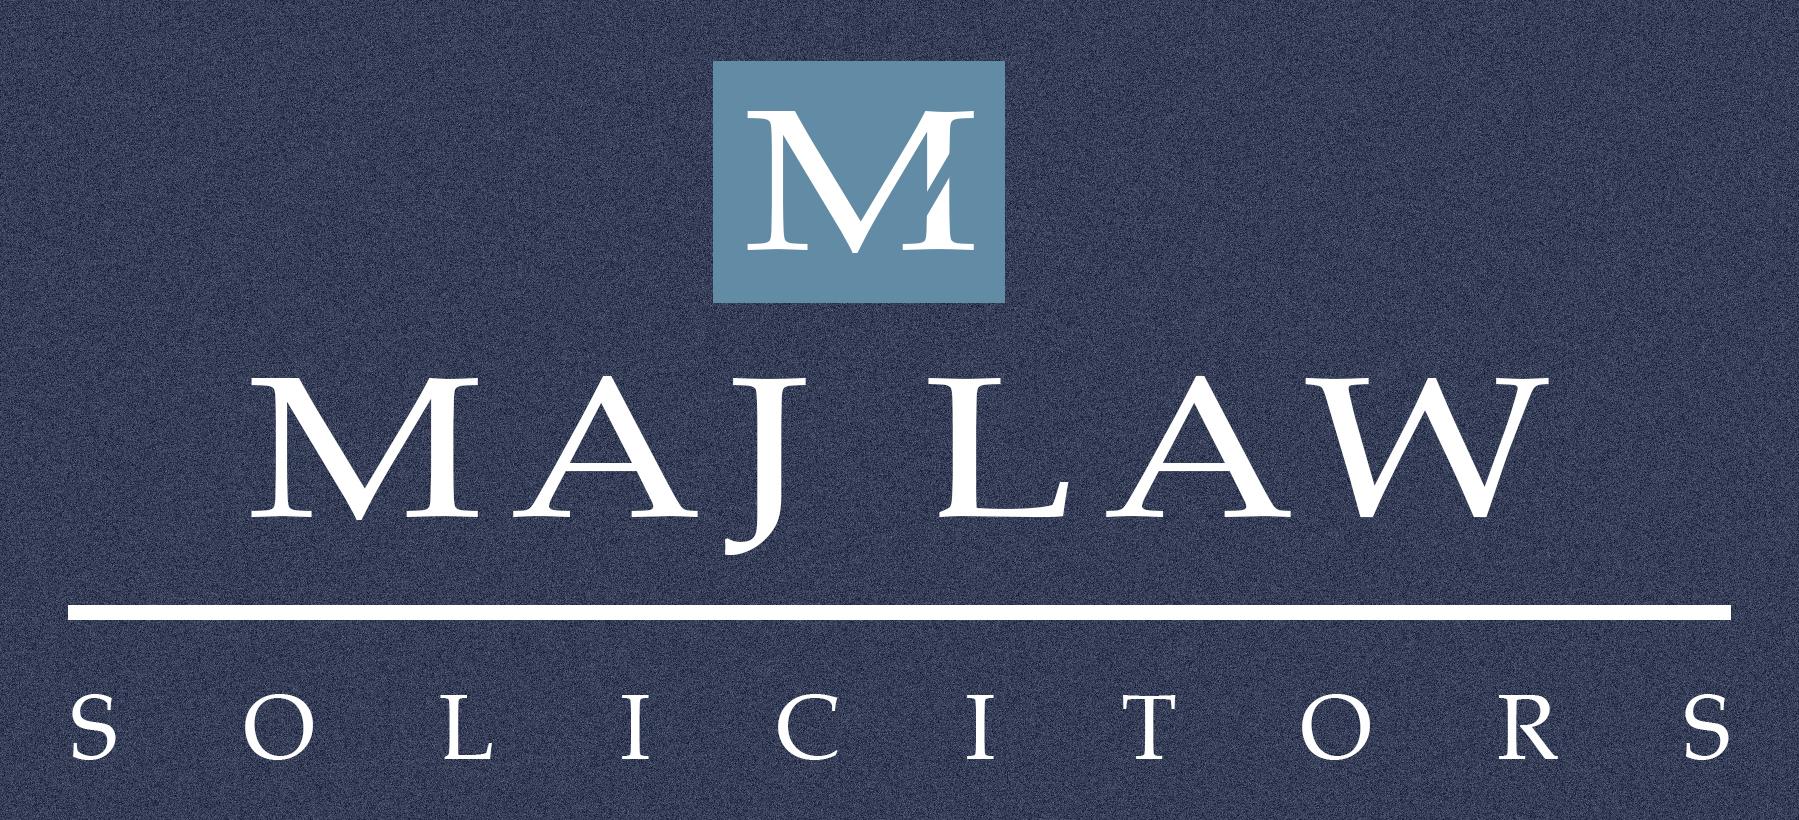 MAJ LAW Letterhead Logo